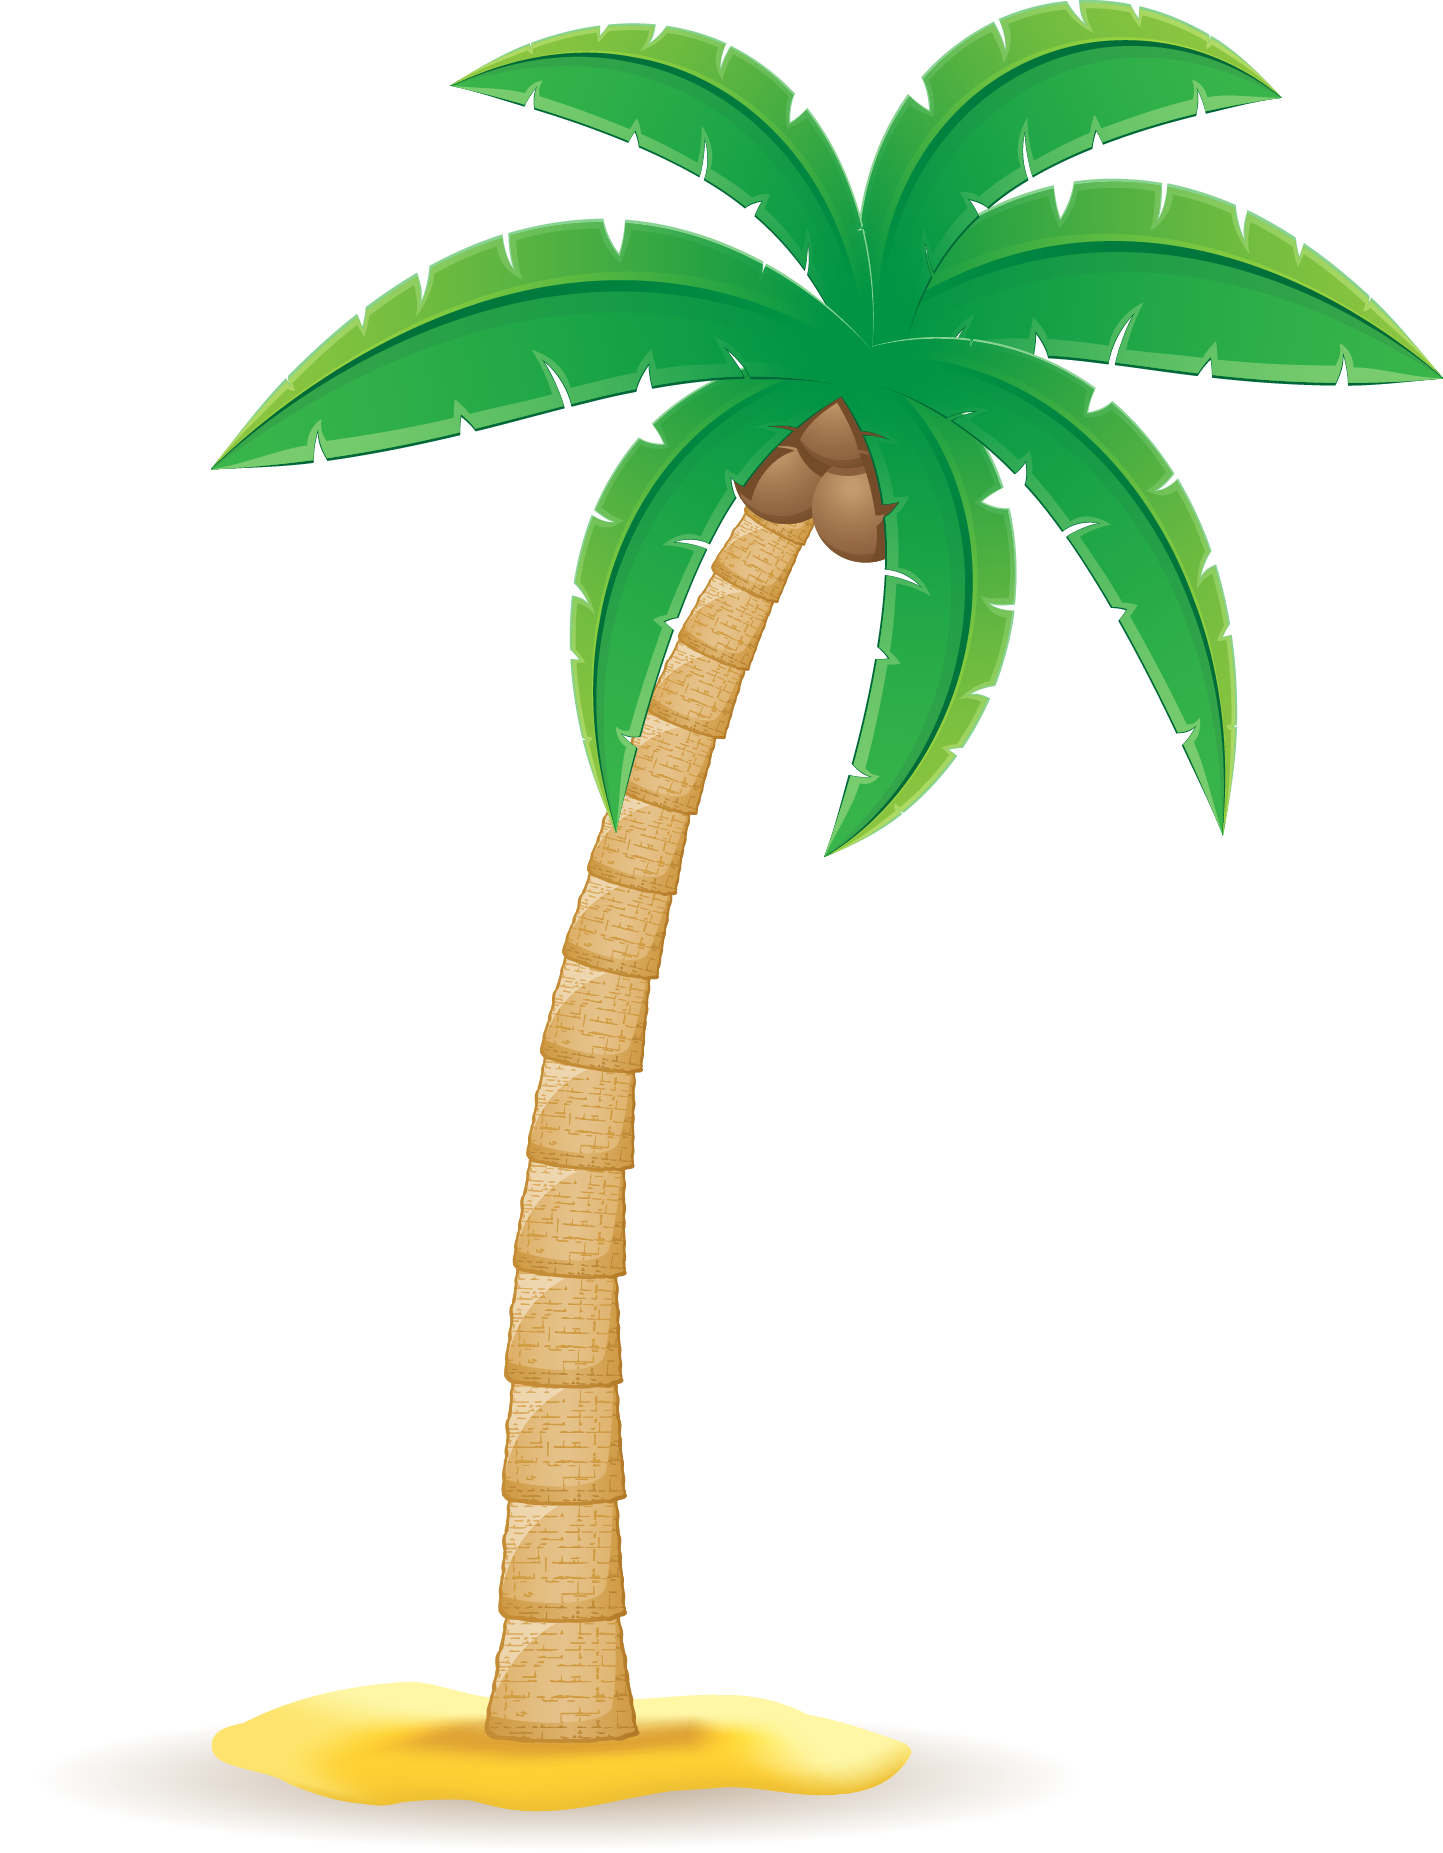 Transparent palm tree leaf clipart - Arecaceae Clip Art Transprent Png Ⓒ - Coconut Tree Vector Png